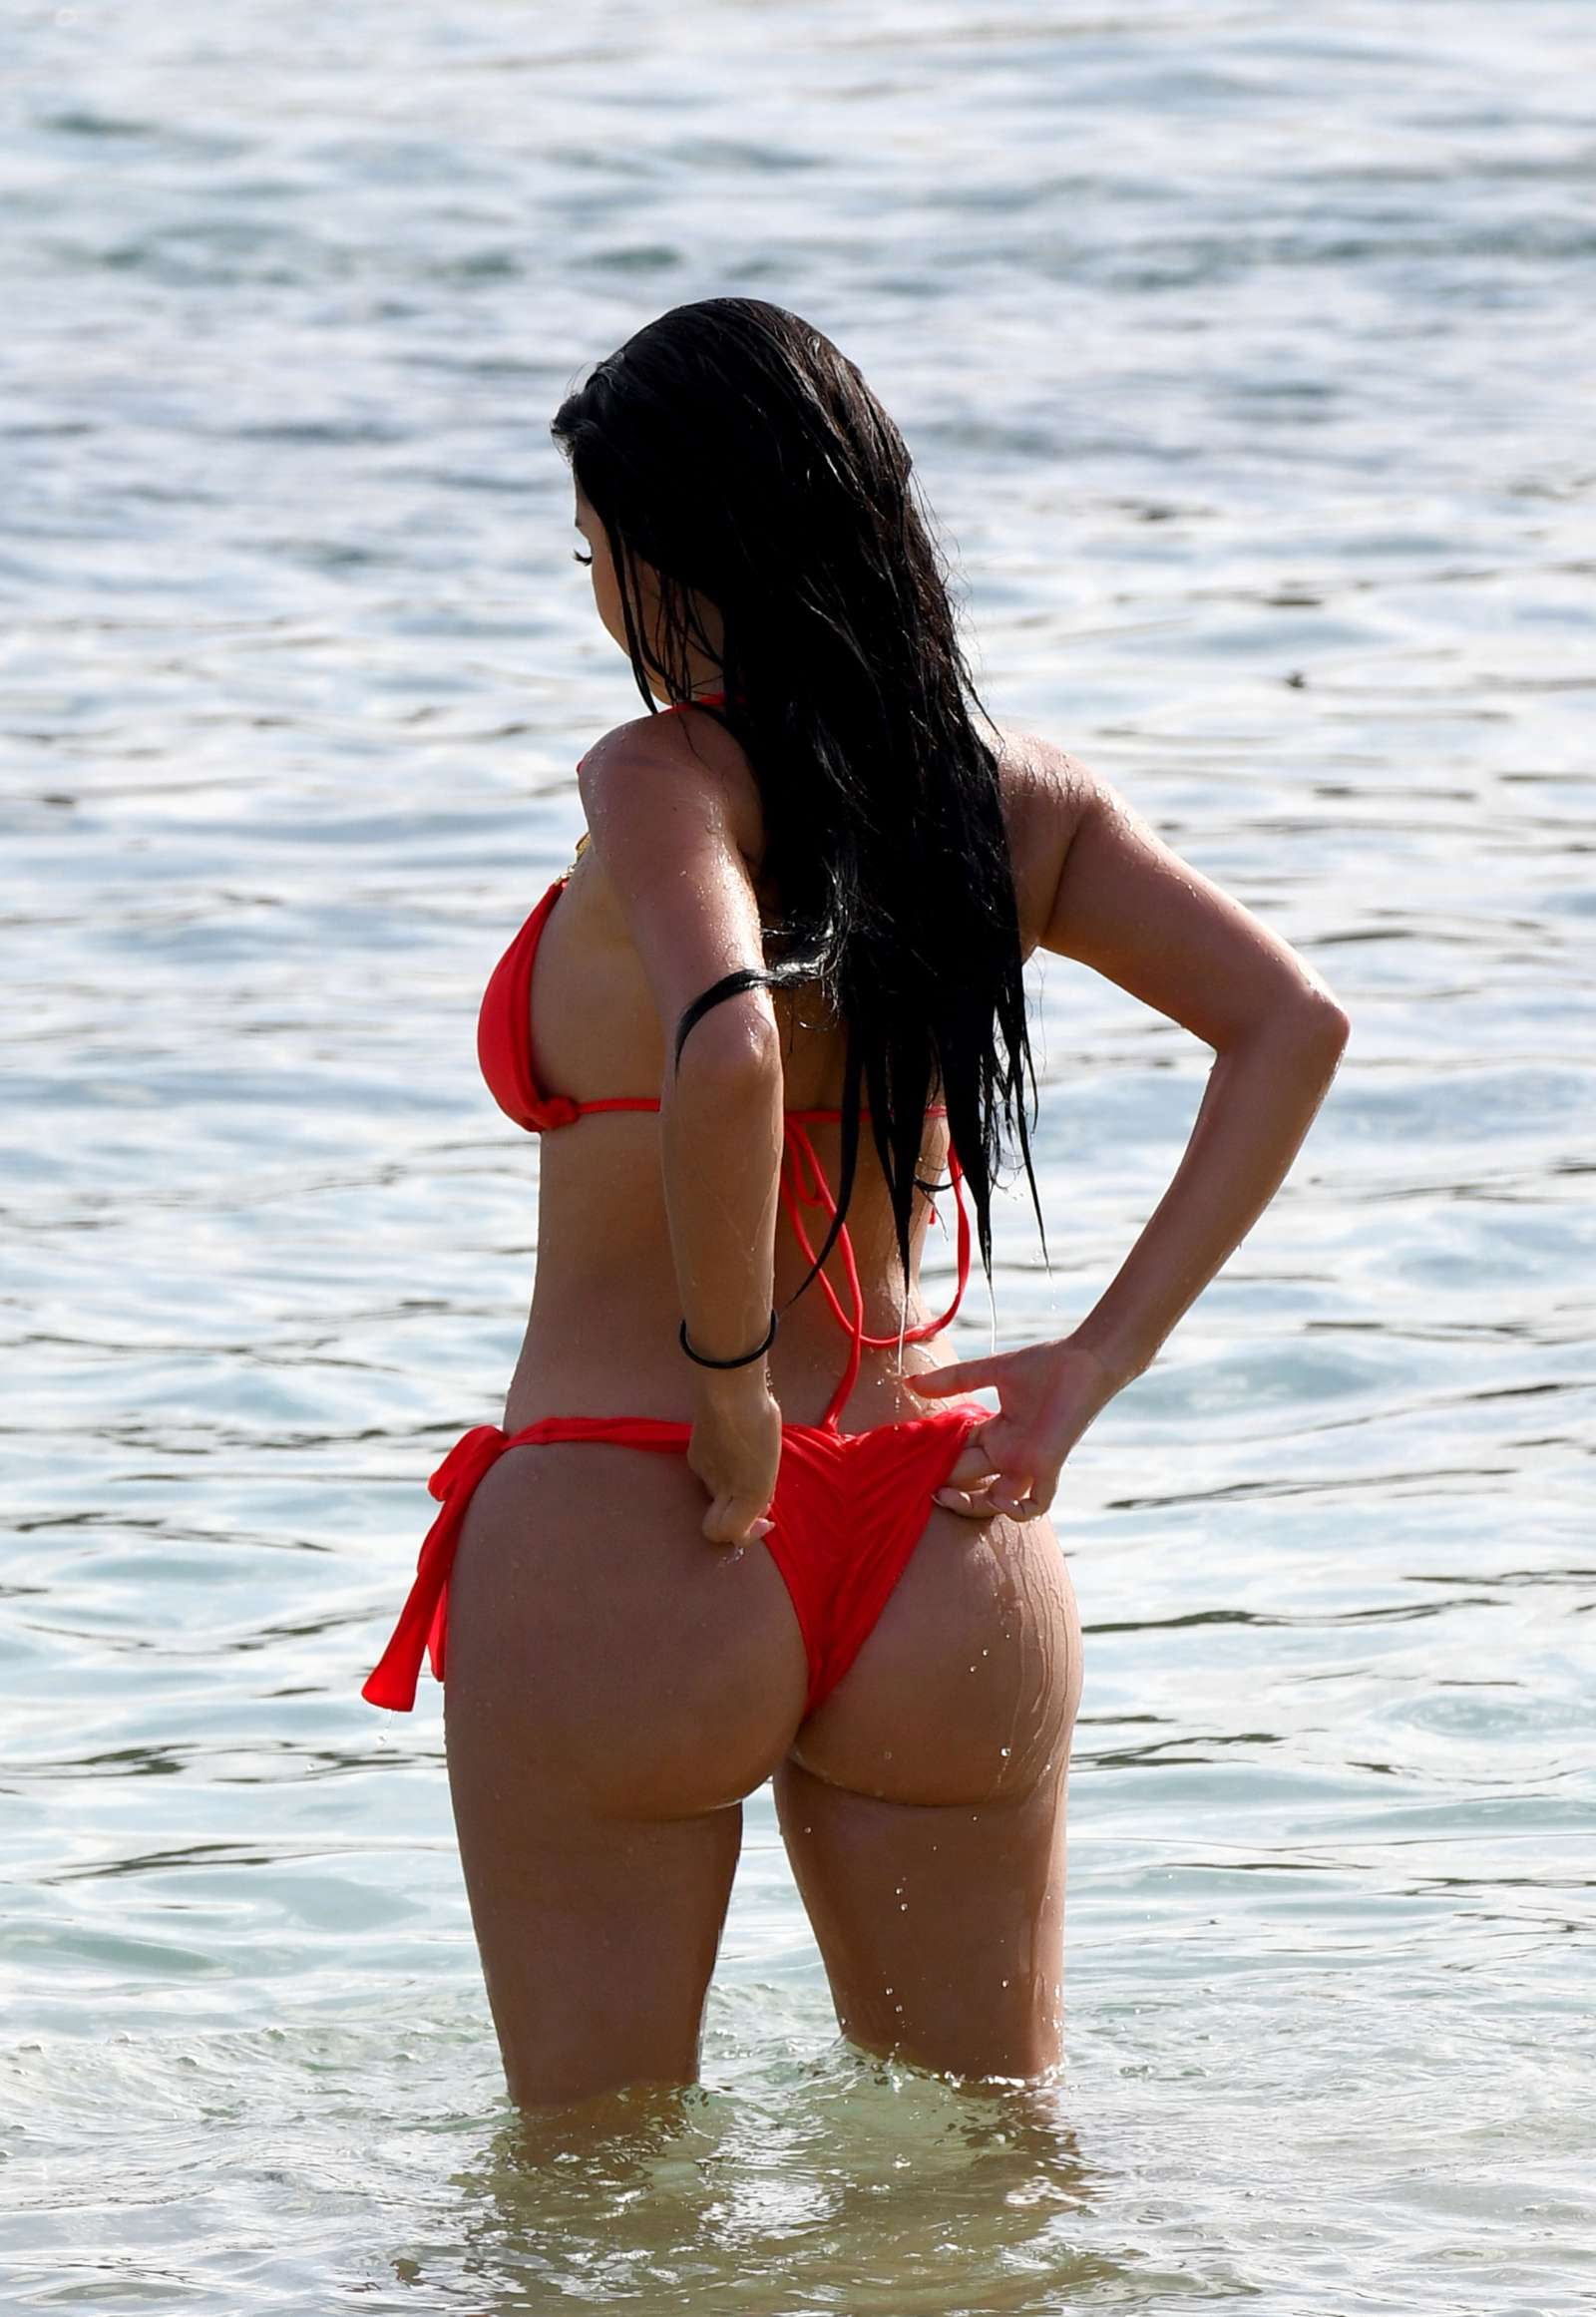 Butt Fanny Beladona nudes (28 photo) Paparazzi, Instagram, butt